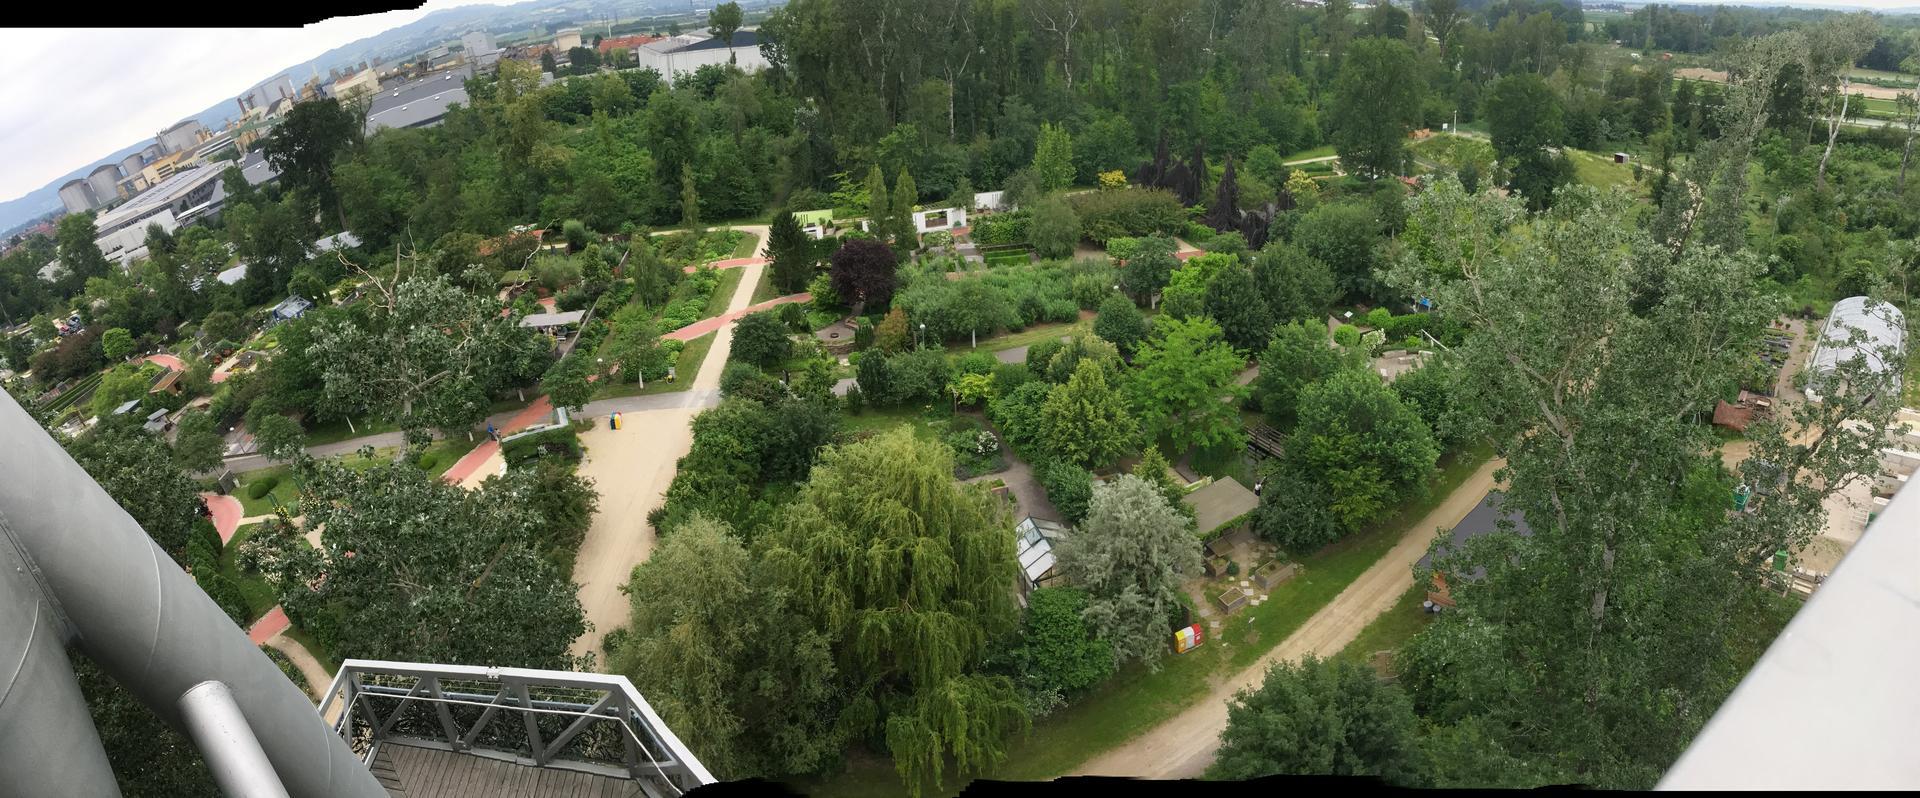 2020 😍 🌞 - Na vylete za inspiraci v zahradach v Tullnu (Rakousko) - pohled na jednotlive zahrady z vyhlidkove veze